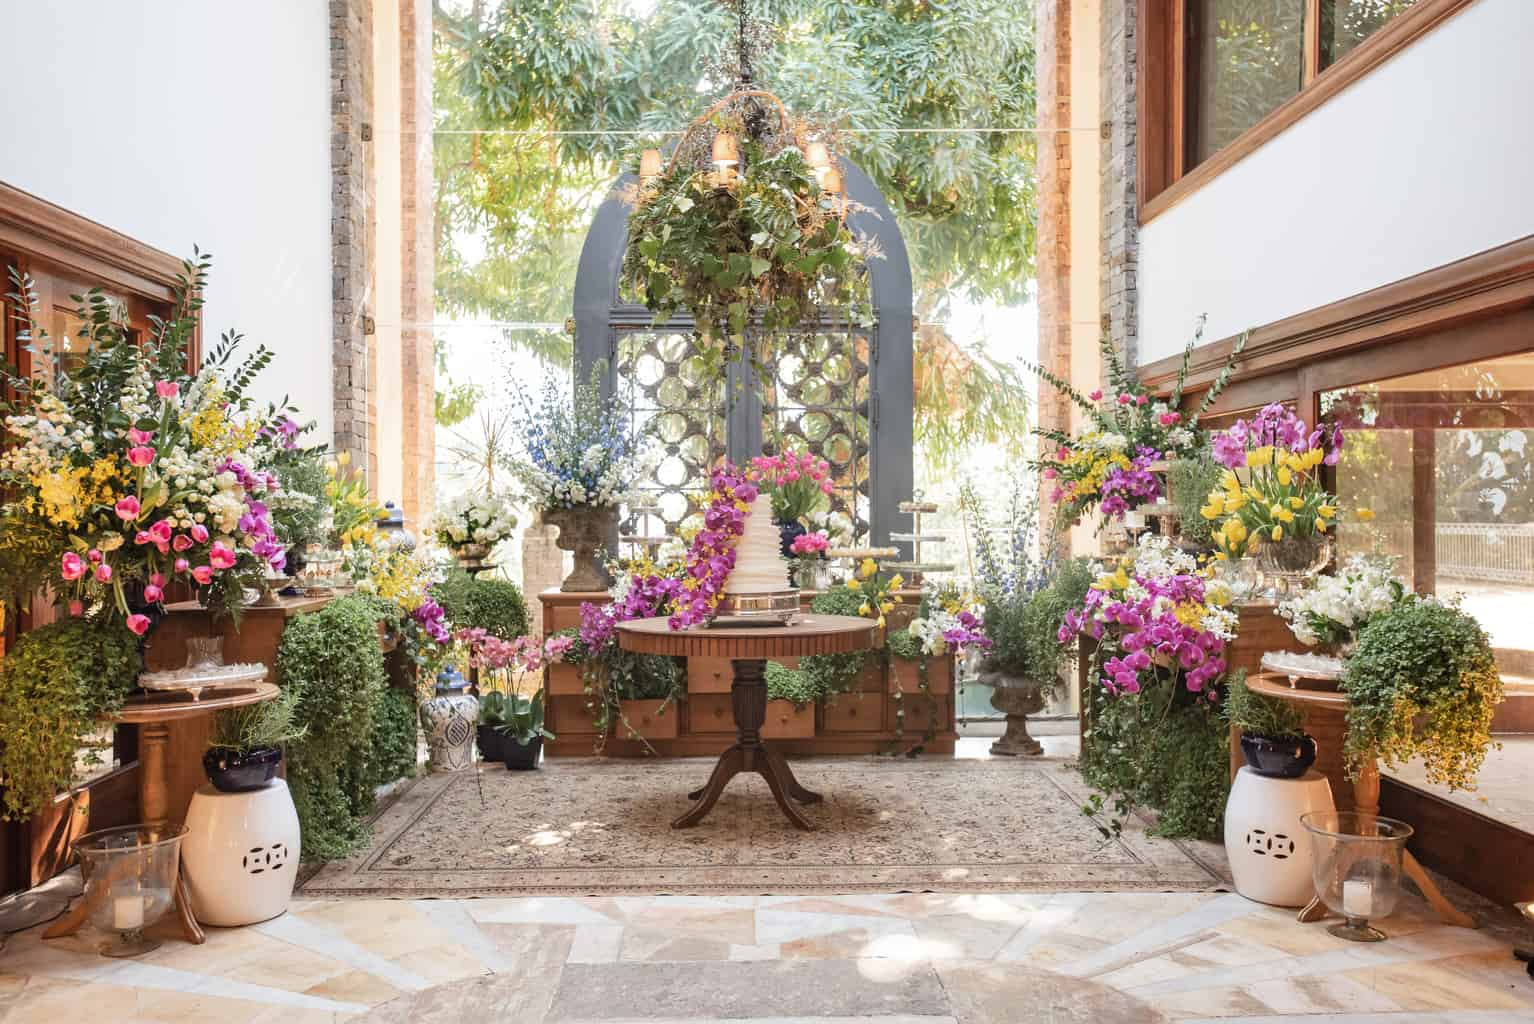 Casamento-Paula-e-Alex-Fotografia-Marina-Fava-Decor-Andrea-Kapps-mesa-do-bolo-1